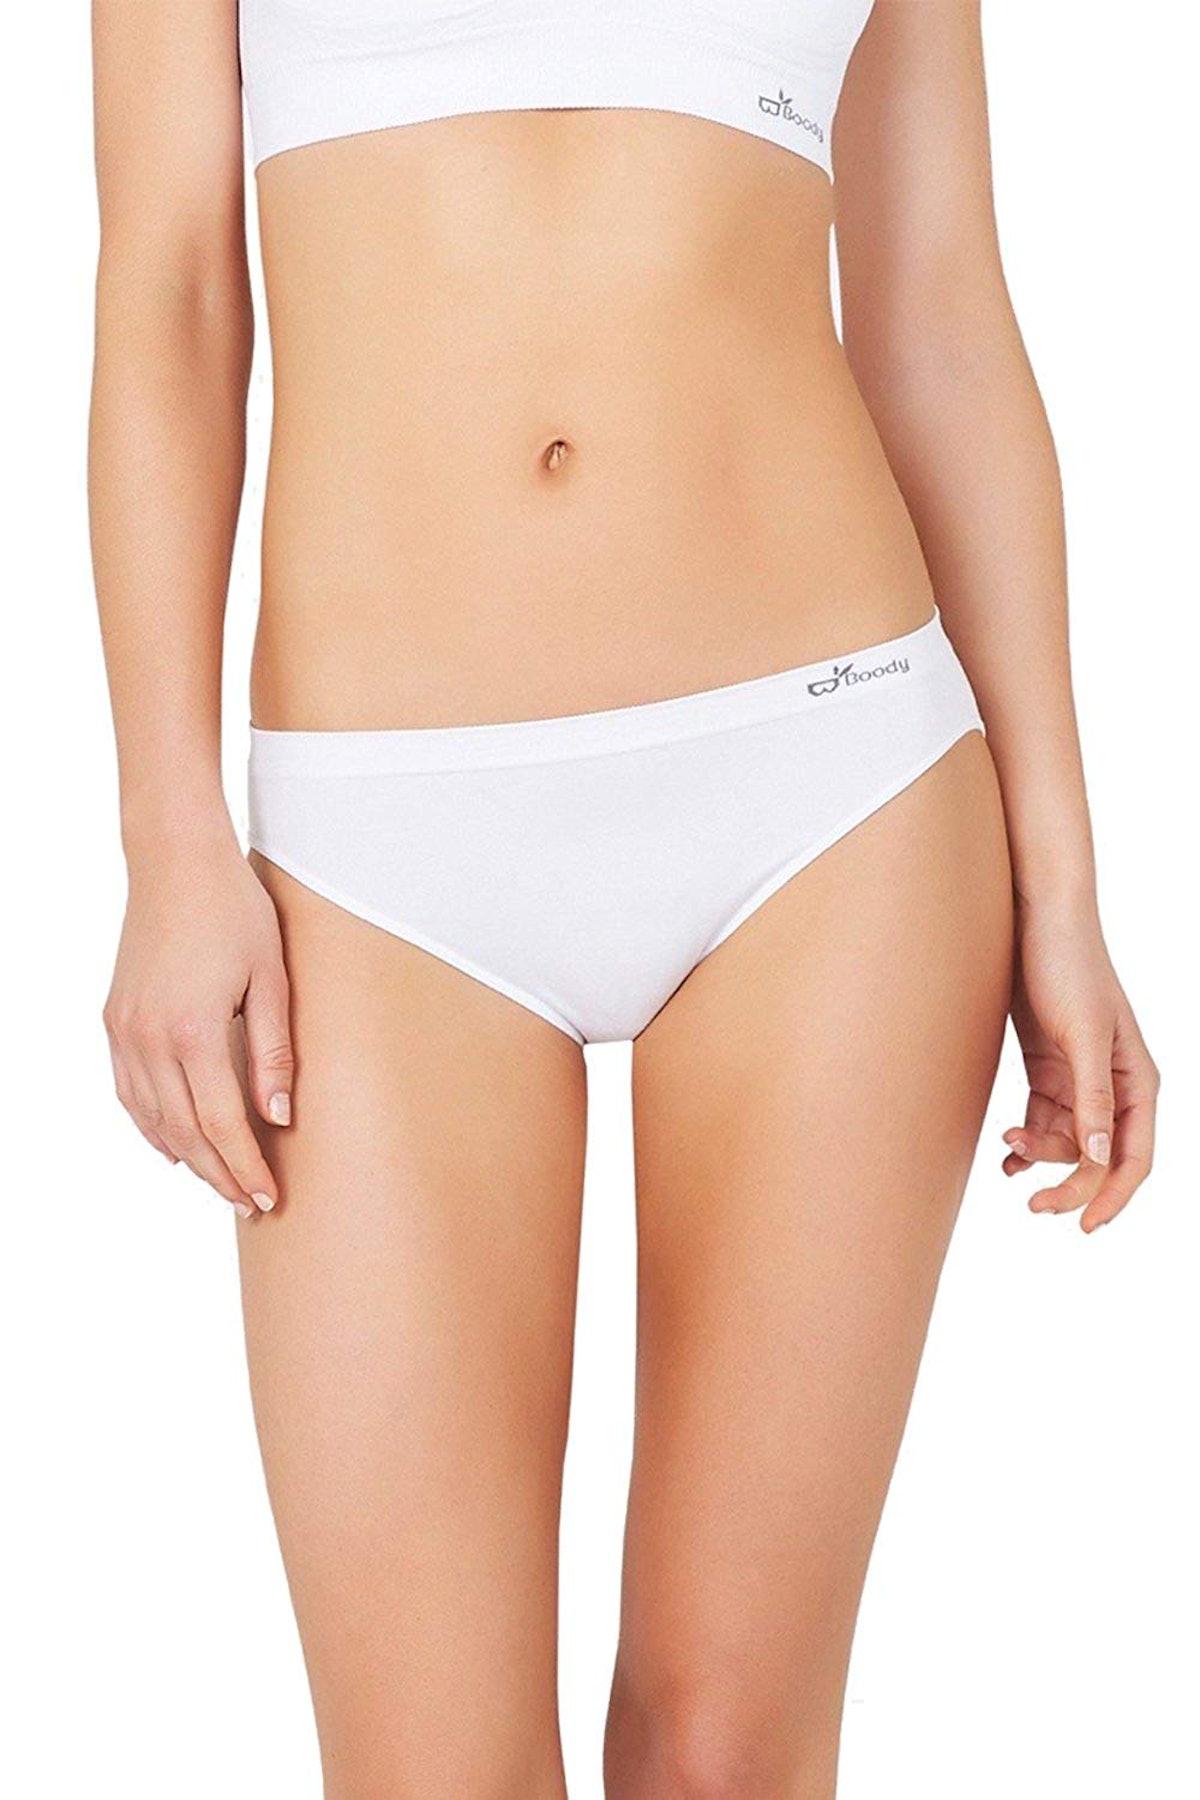 Boody Body EcoWear Women's Classic Bikini (Pack of 2)